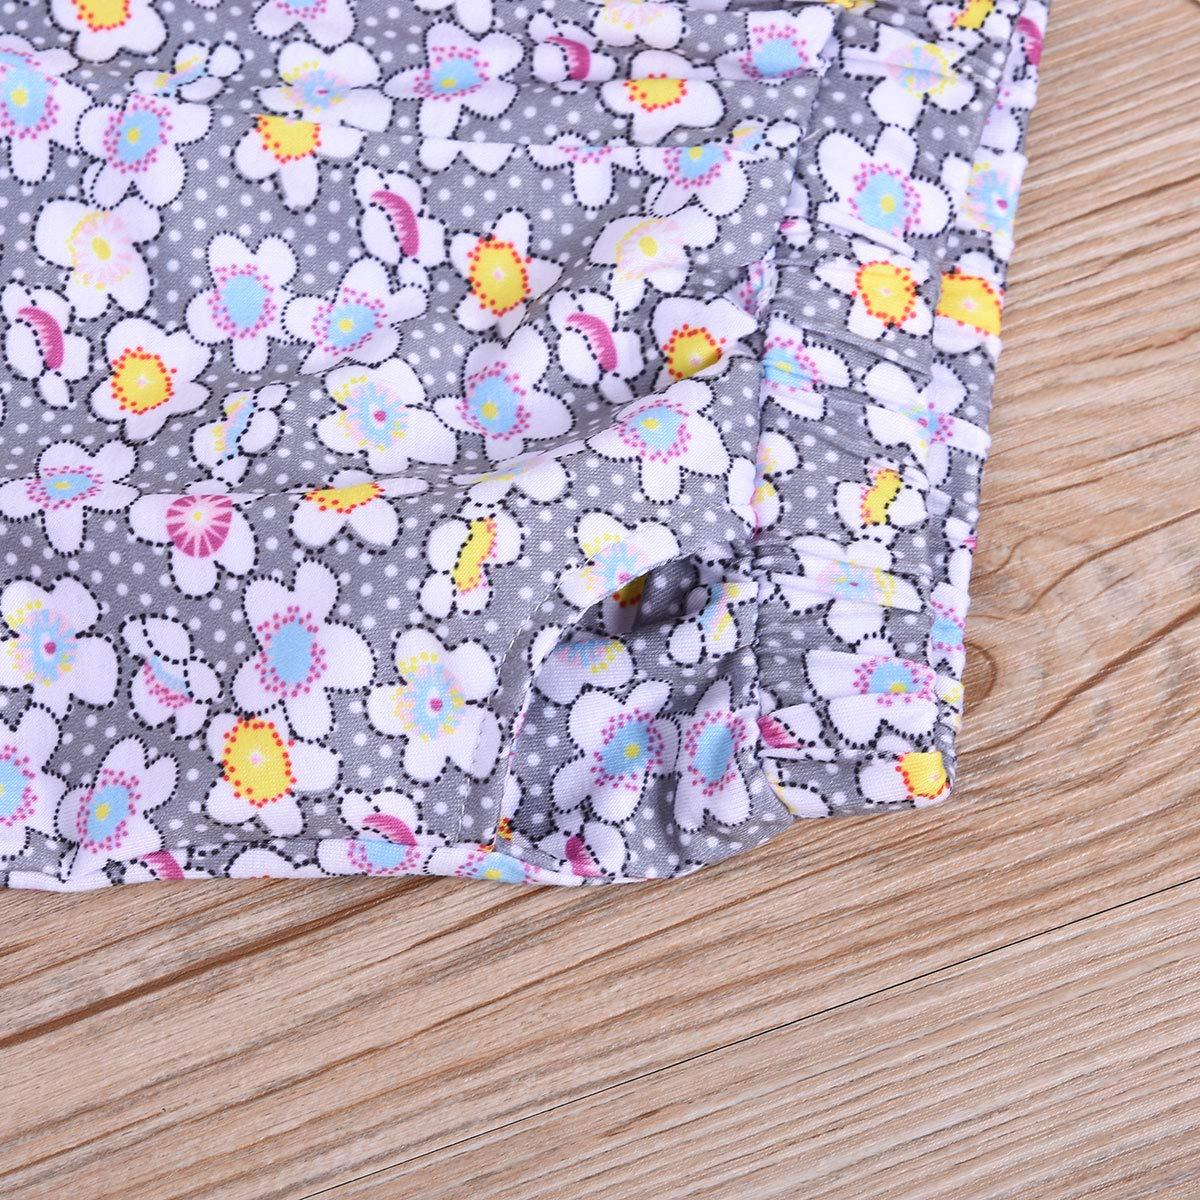 Girls Ruffled Print Top Shirt Floral Pants Shorts Children Outfit Suit 2pcs